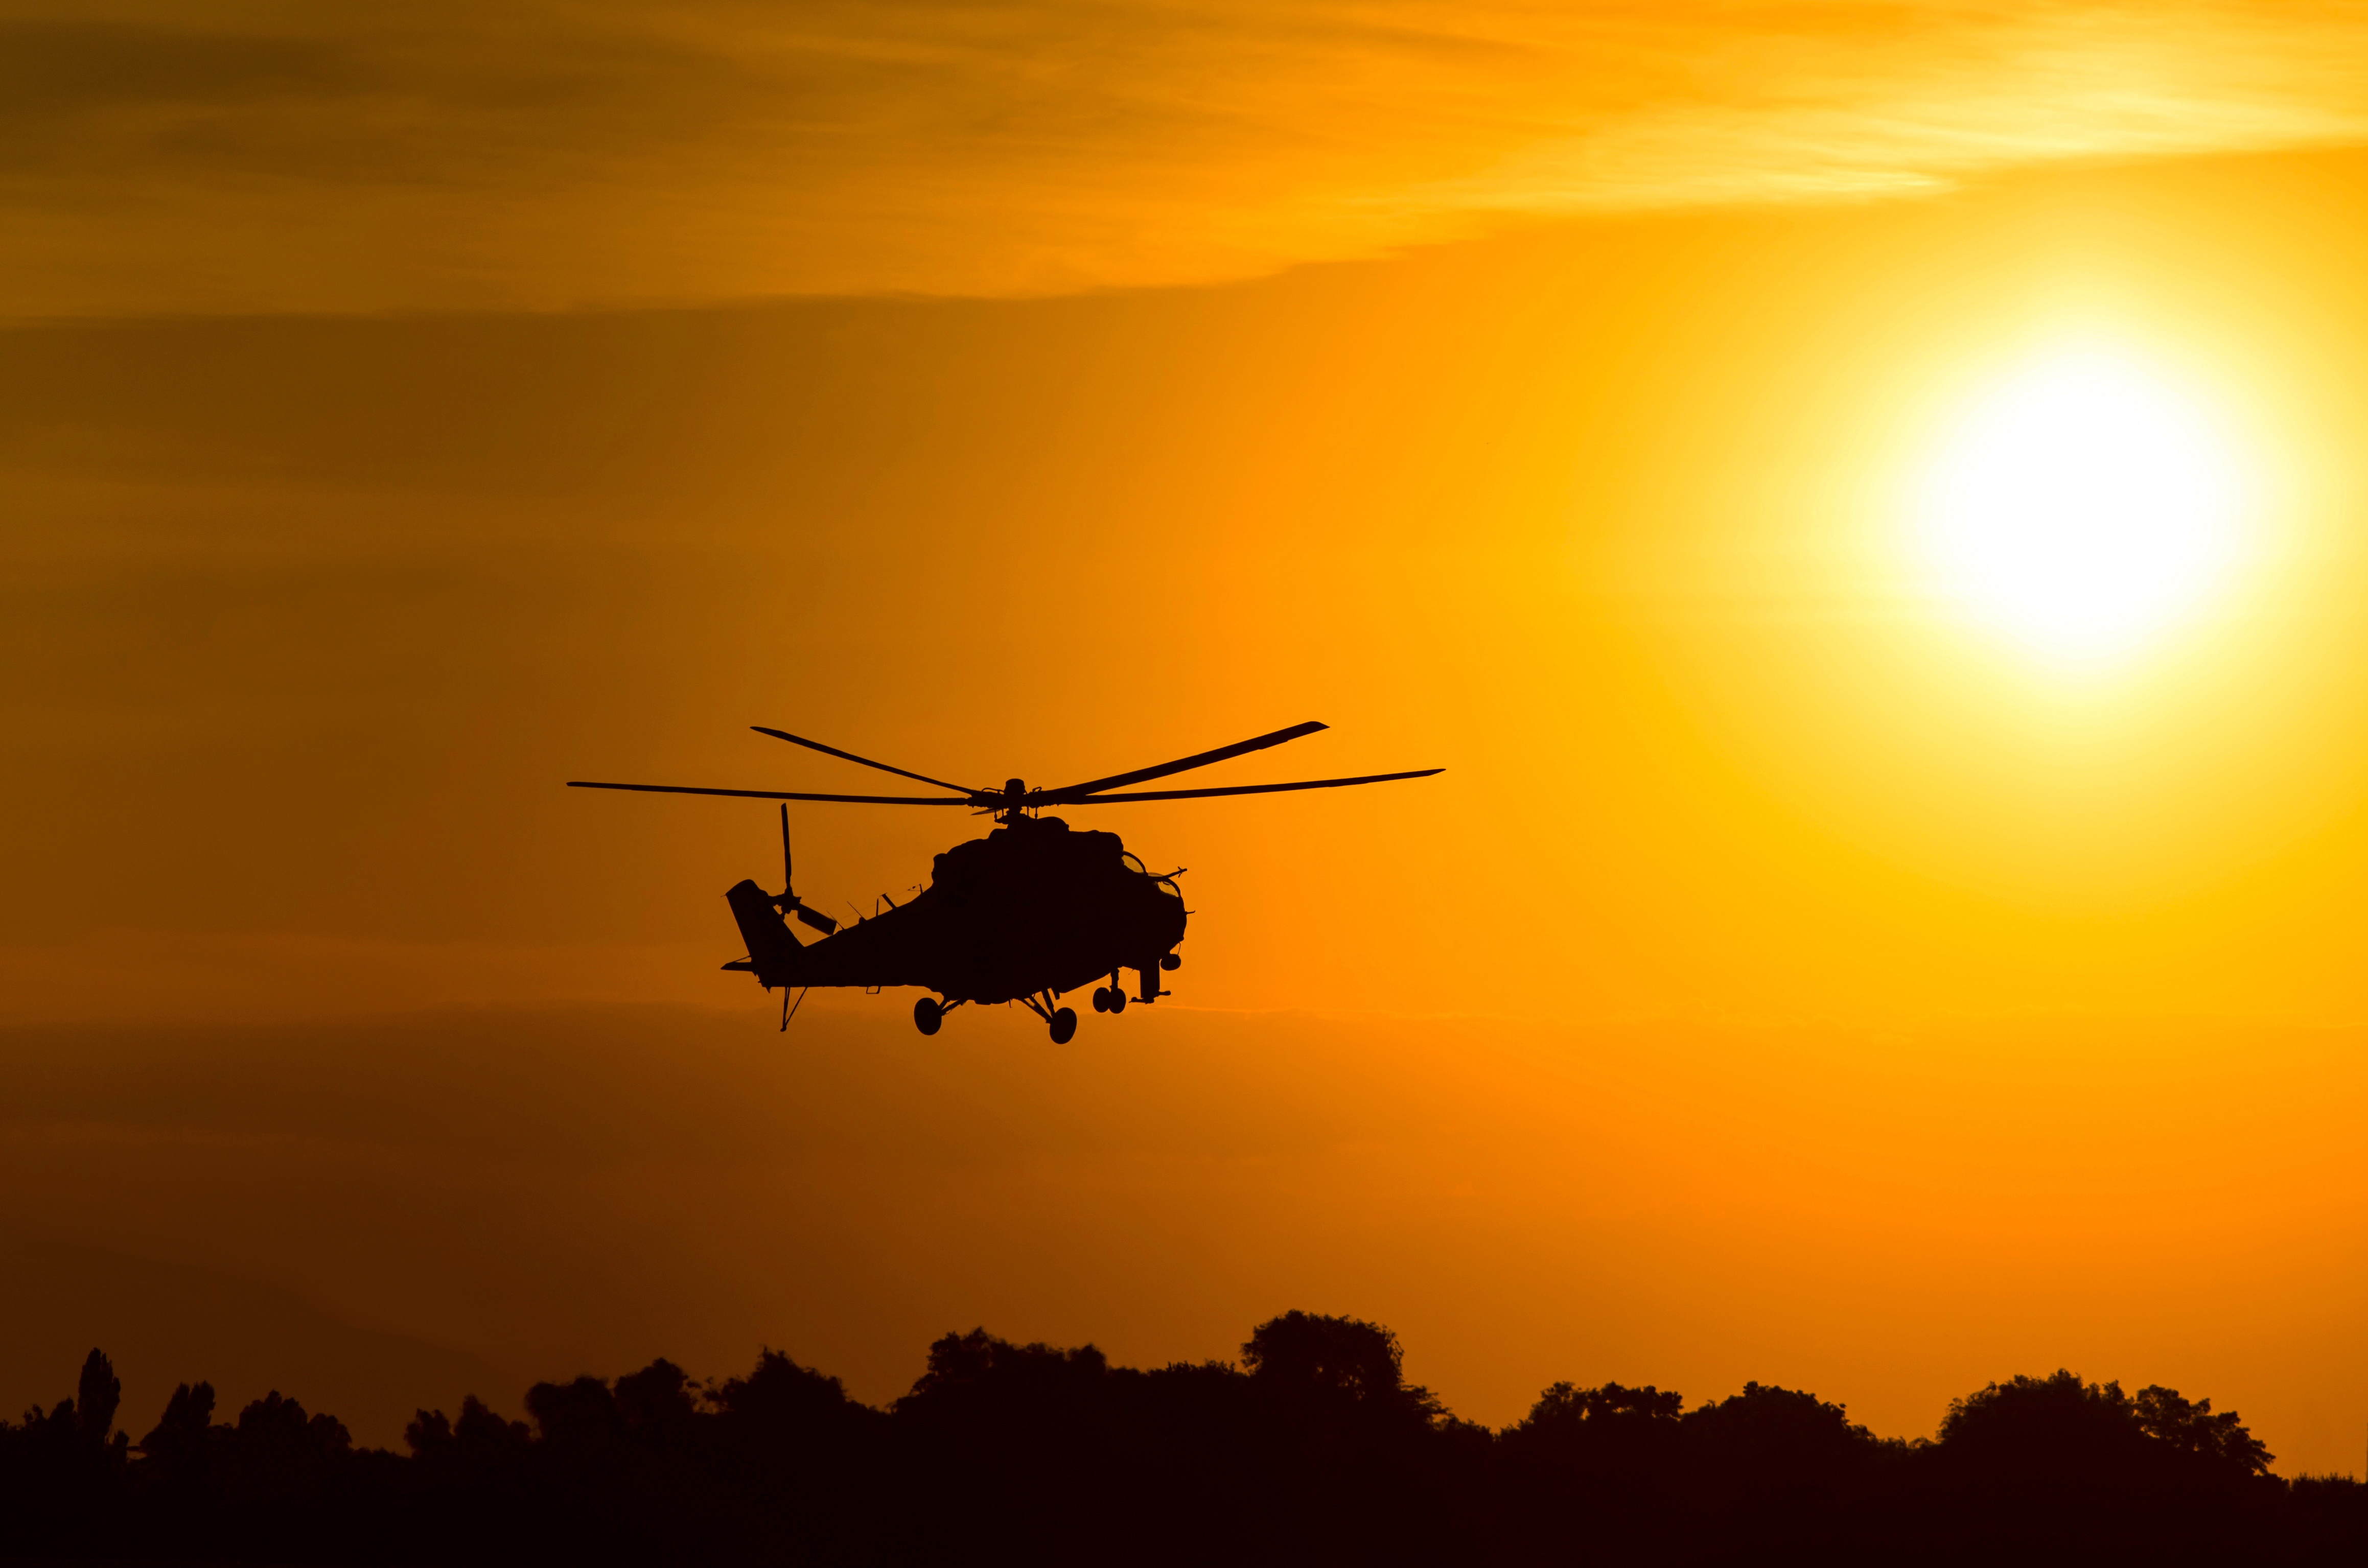 Military Helicopter 4k Hd Desktop Wallpaper For 4k Ultra: Mil Mi-24 4k Ultra HD Wallpaper